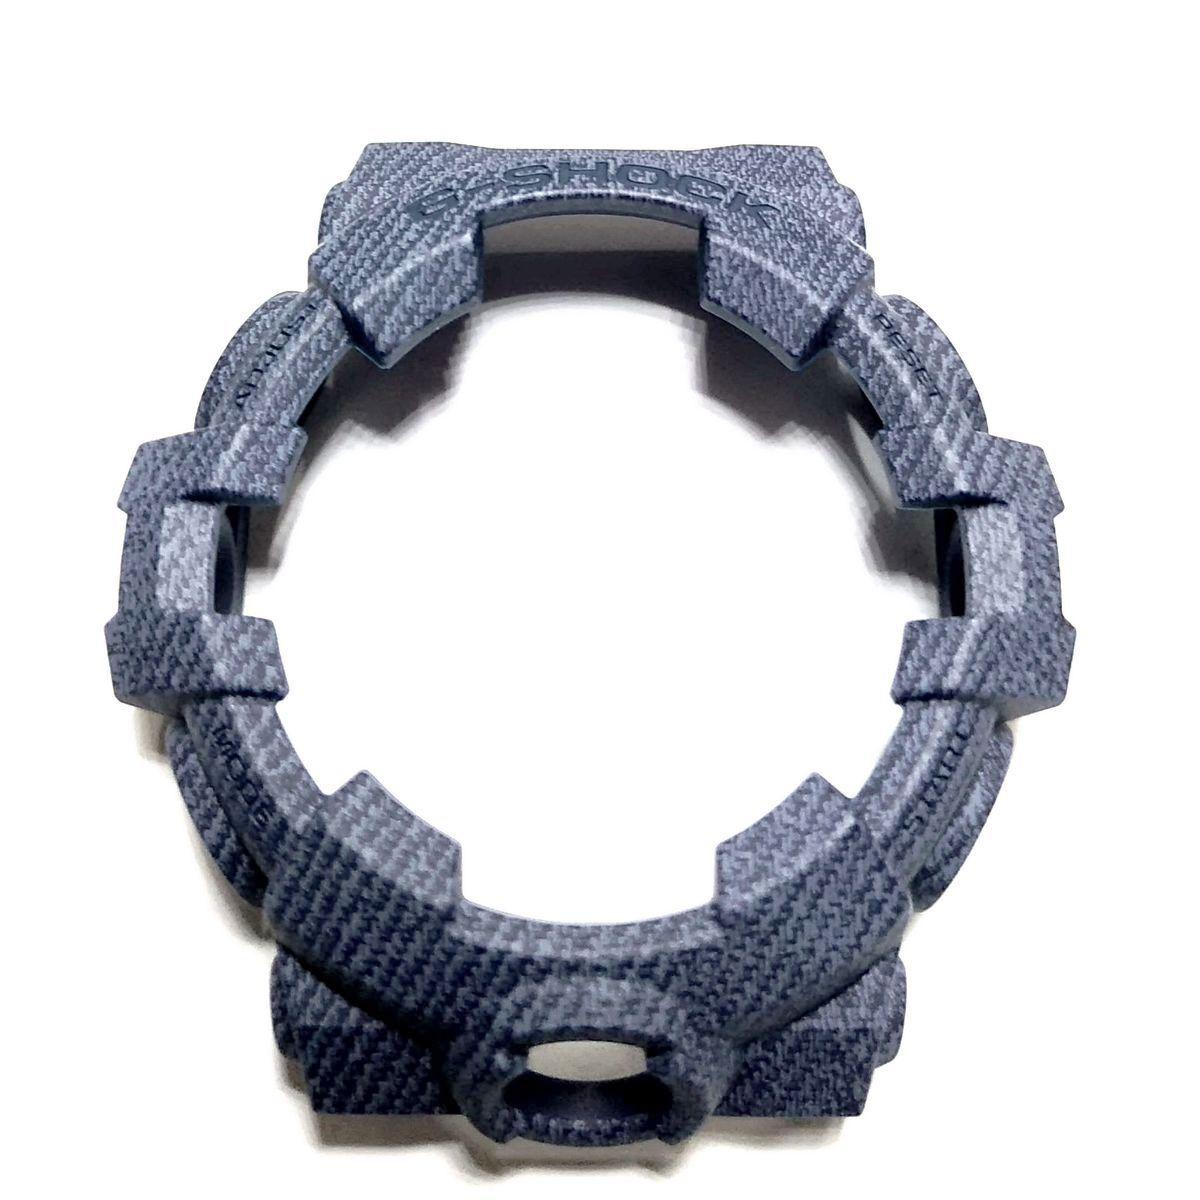 Bezel Casio G-shock GA-700DE-2A Resina Azul Texturizado Jeans  - E-Presentes